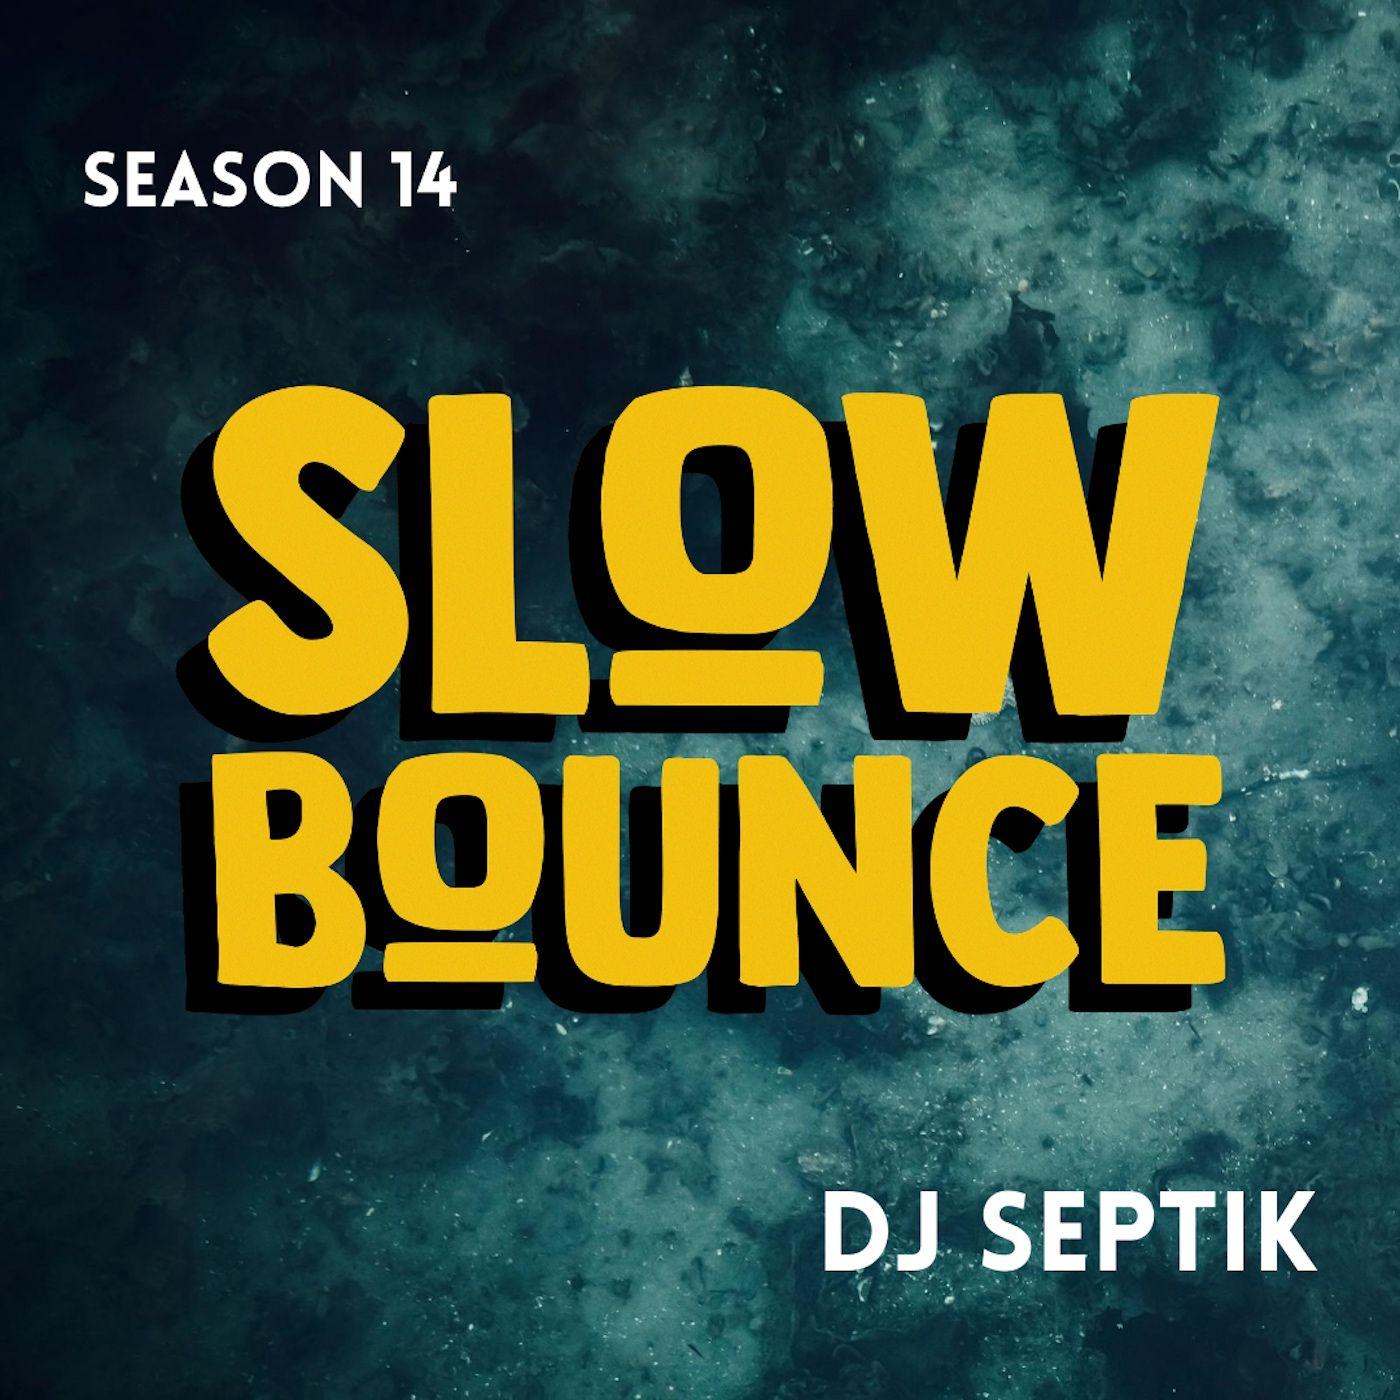 Bigupradio.com SLOWBOUNCE - Dancehall with Dj Septik